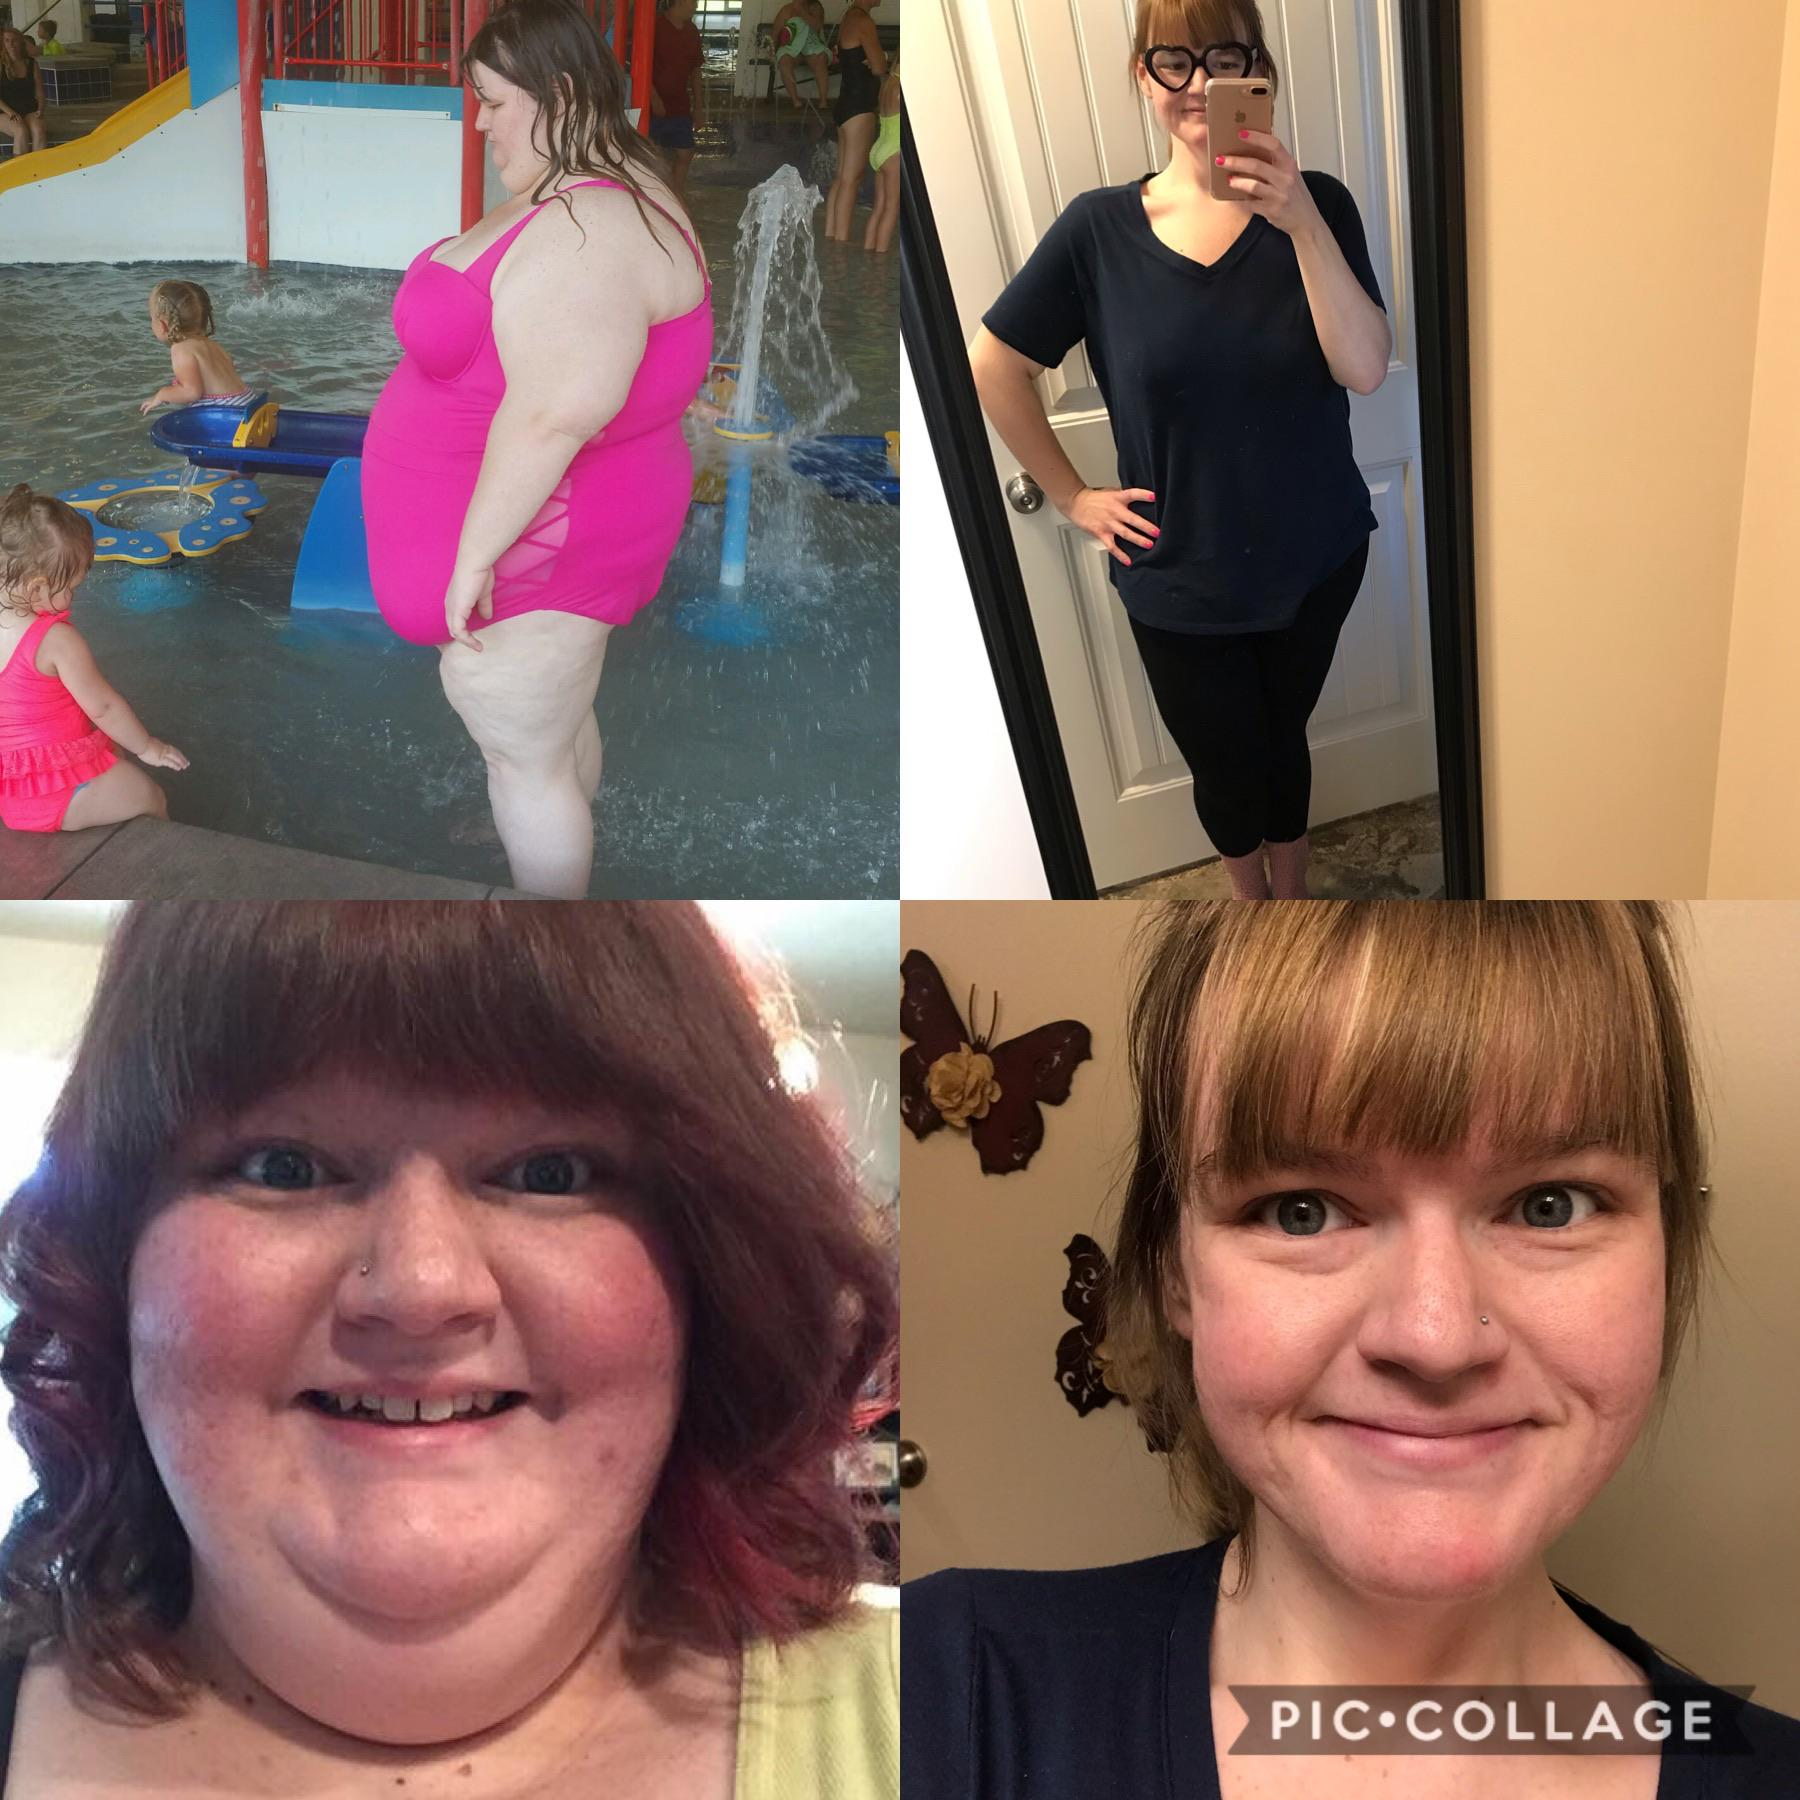 226 lbs Fat Loss 5'6 Female 425 lbs to 199 lbs